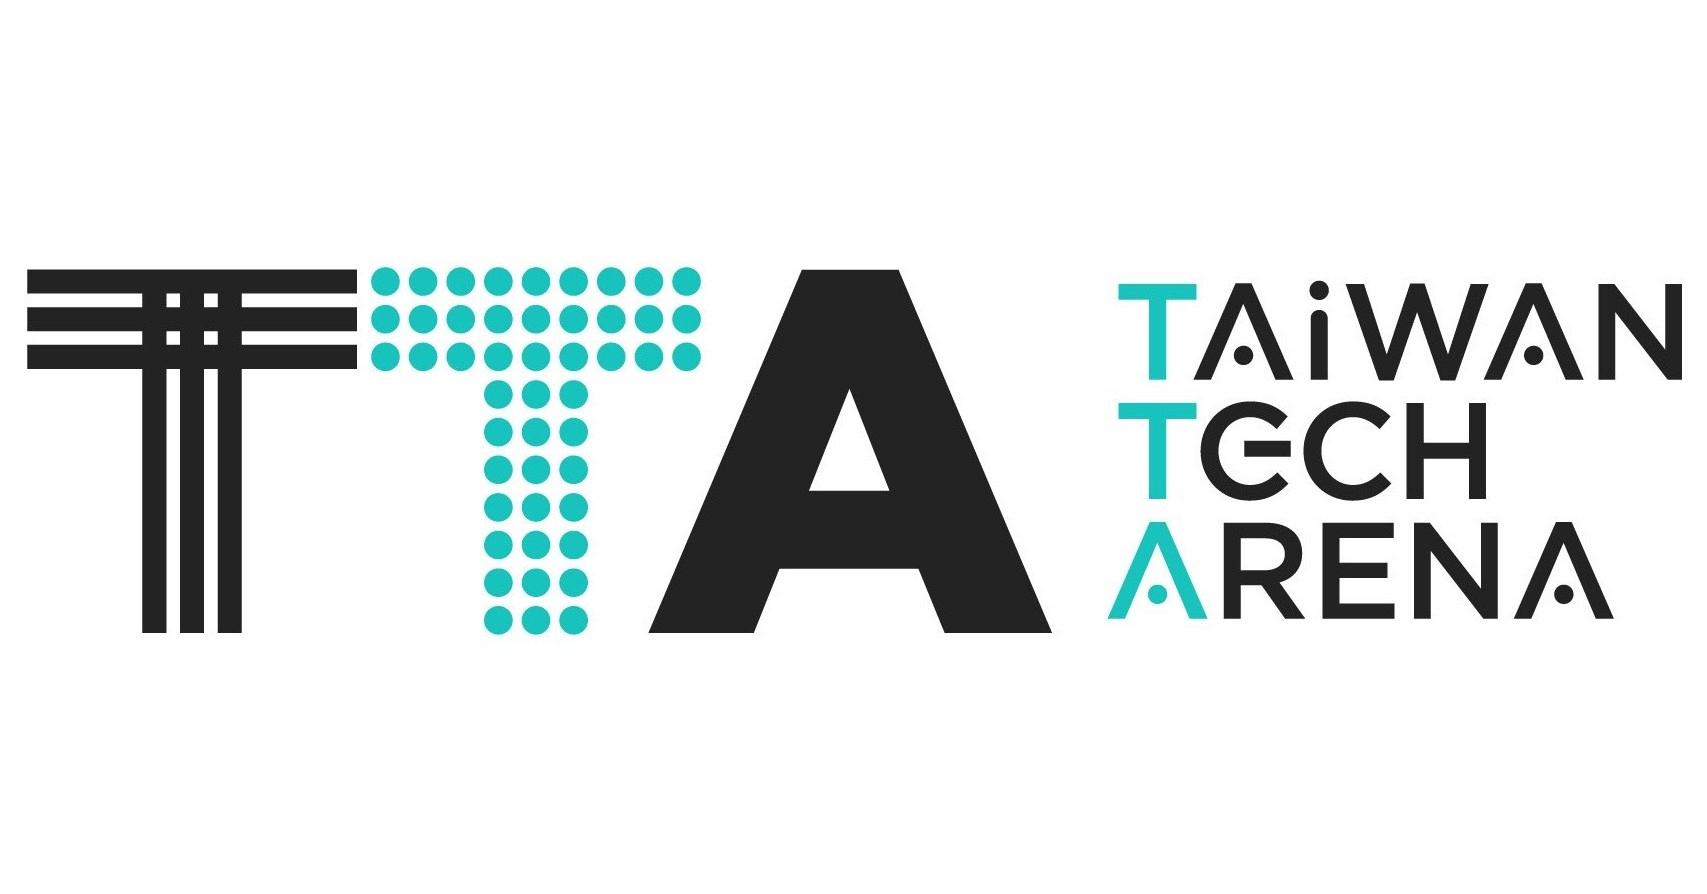 Taiwan Tech Arena logo